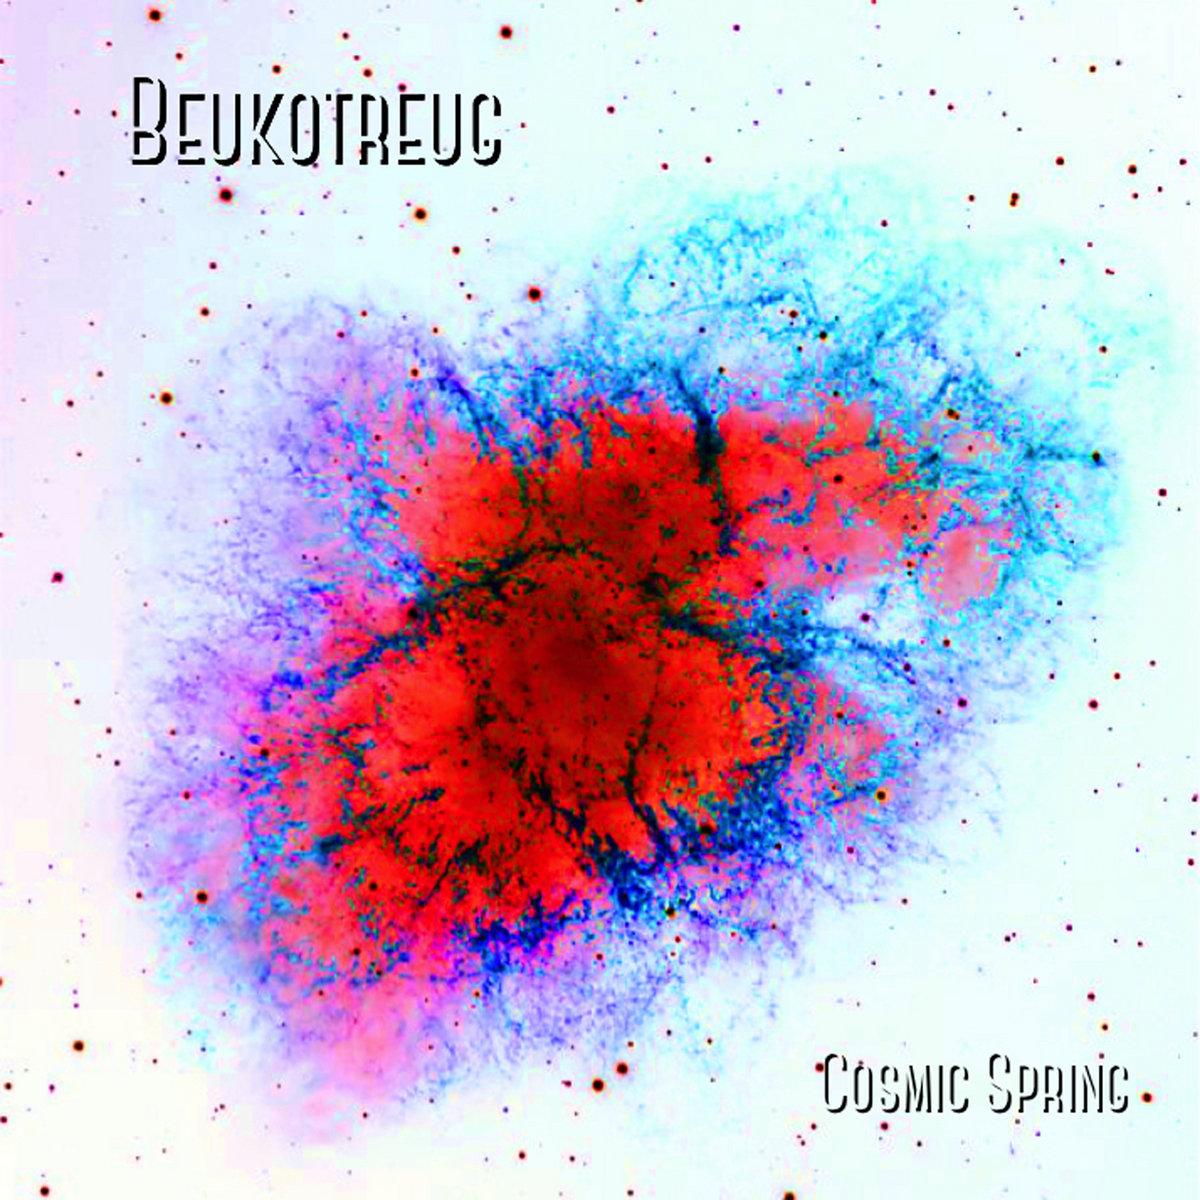 Cosmic Spring | Beukotreug